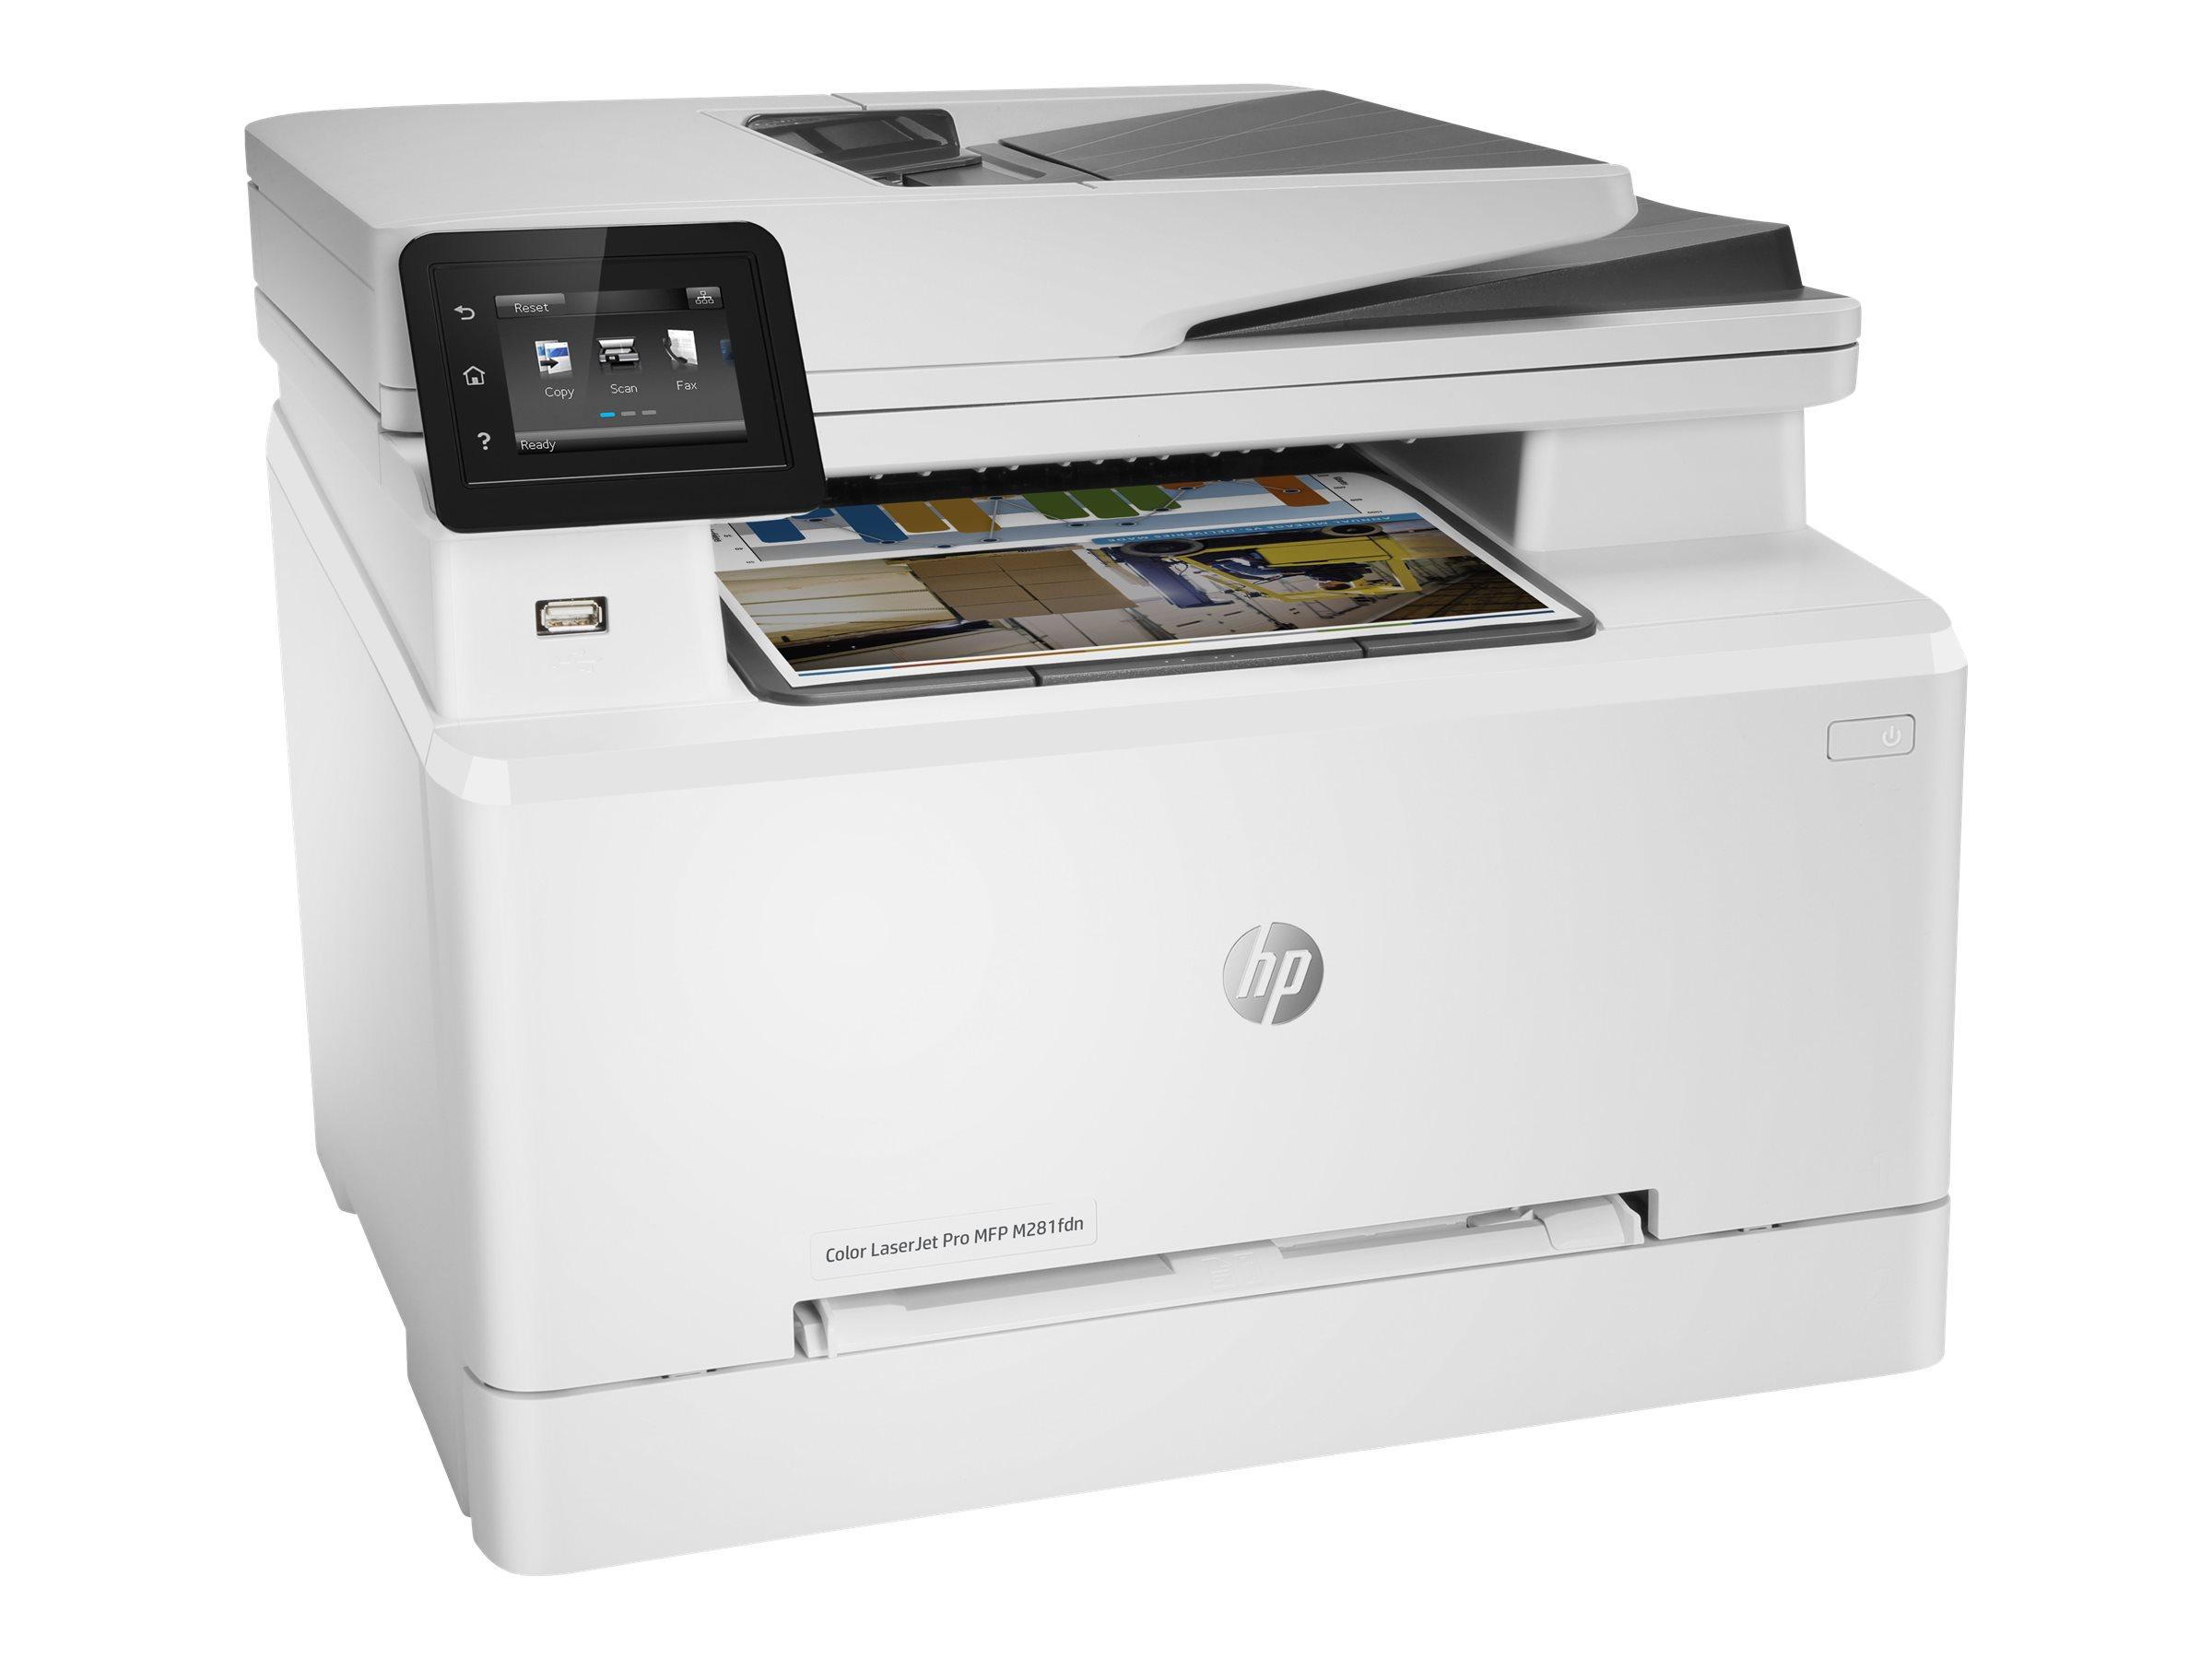 HP Color LaserJet Pro MFP M281fdn, Farblaser, MFP, A4